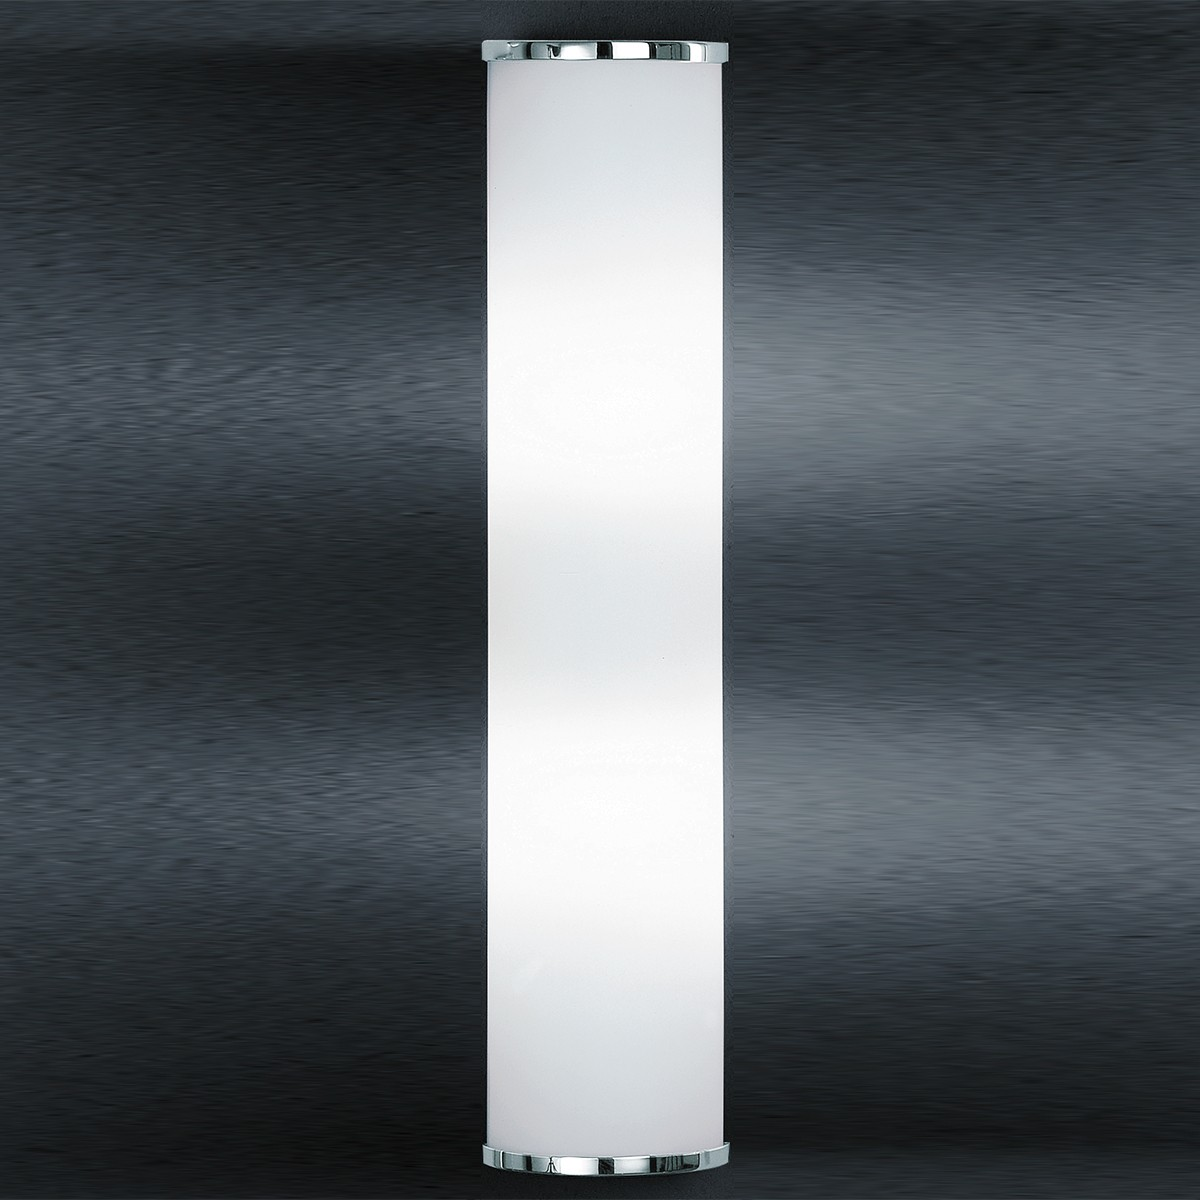 Bankamp Cromo Wandleuchte, Höhe: 40 cm, Chrom